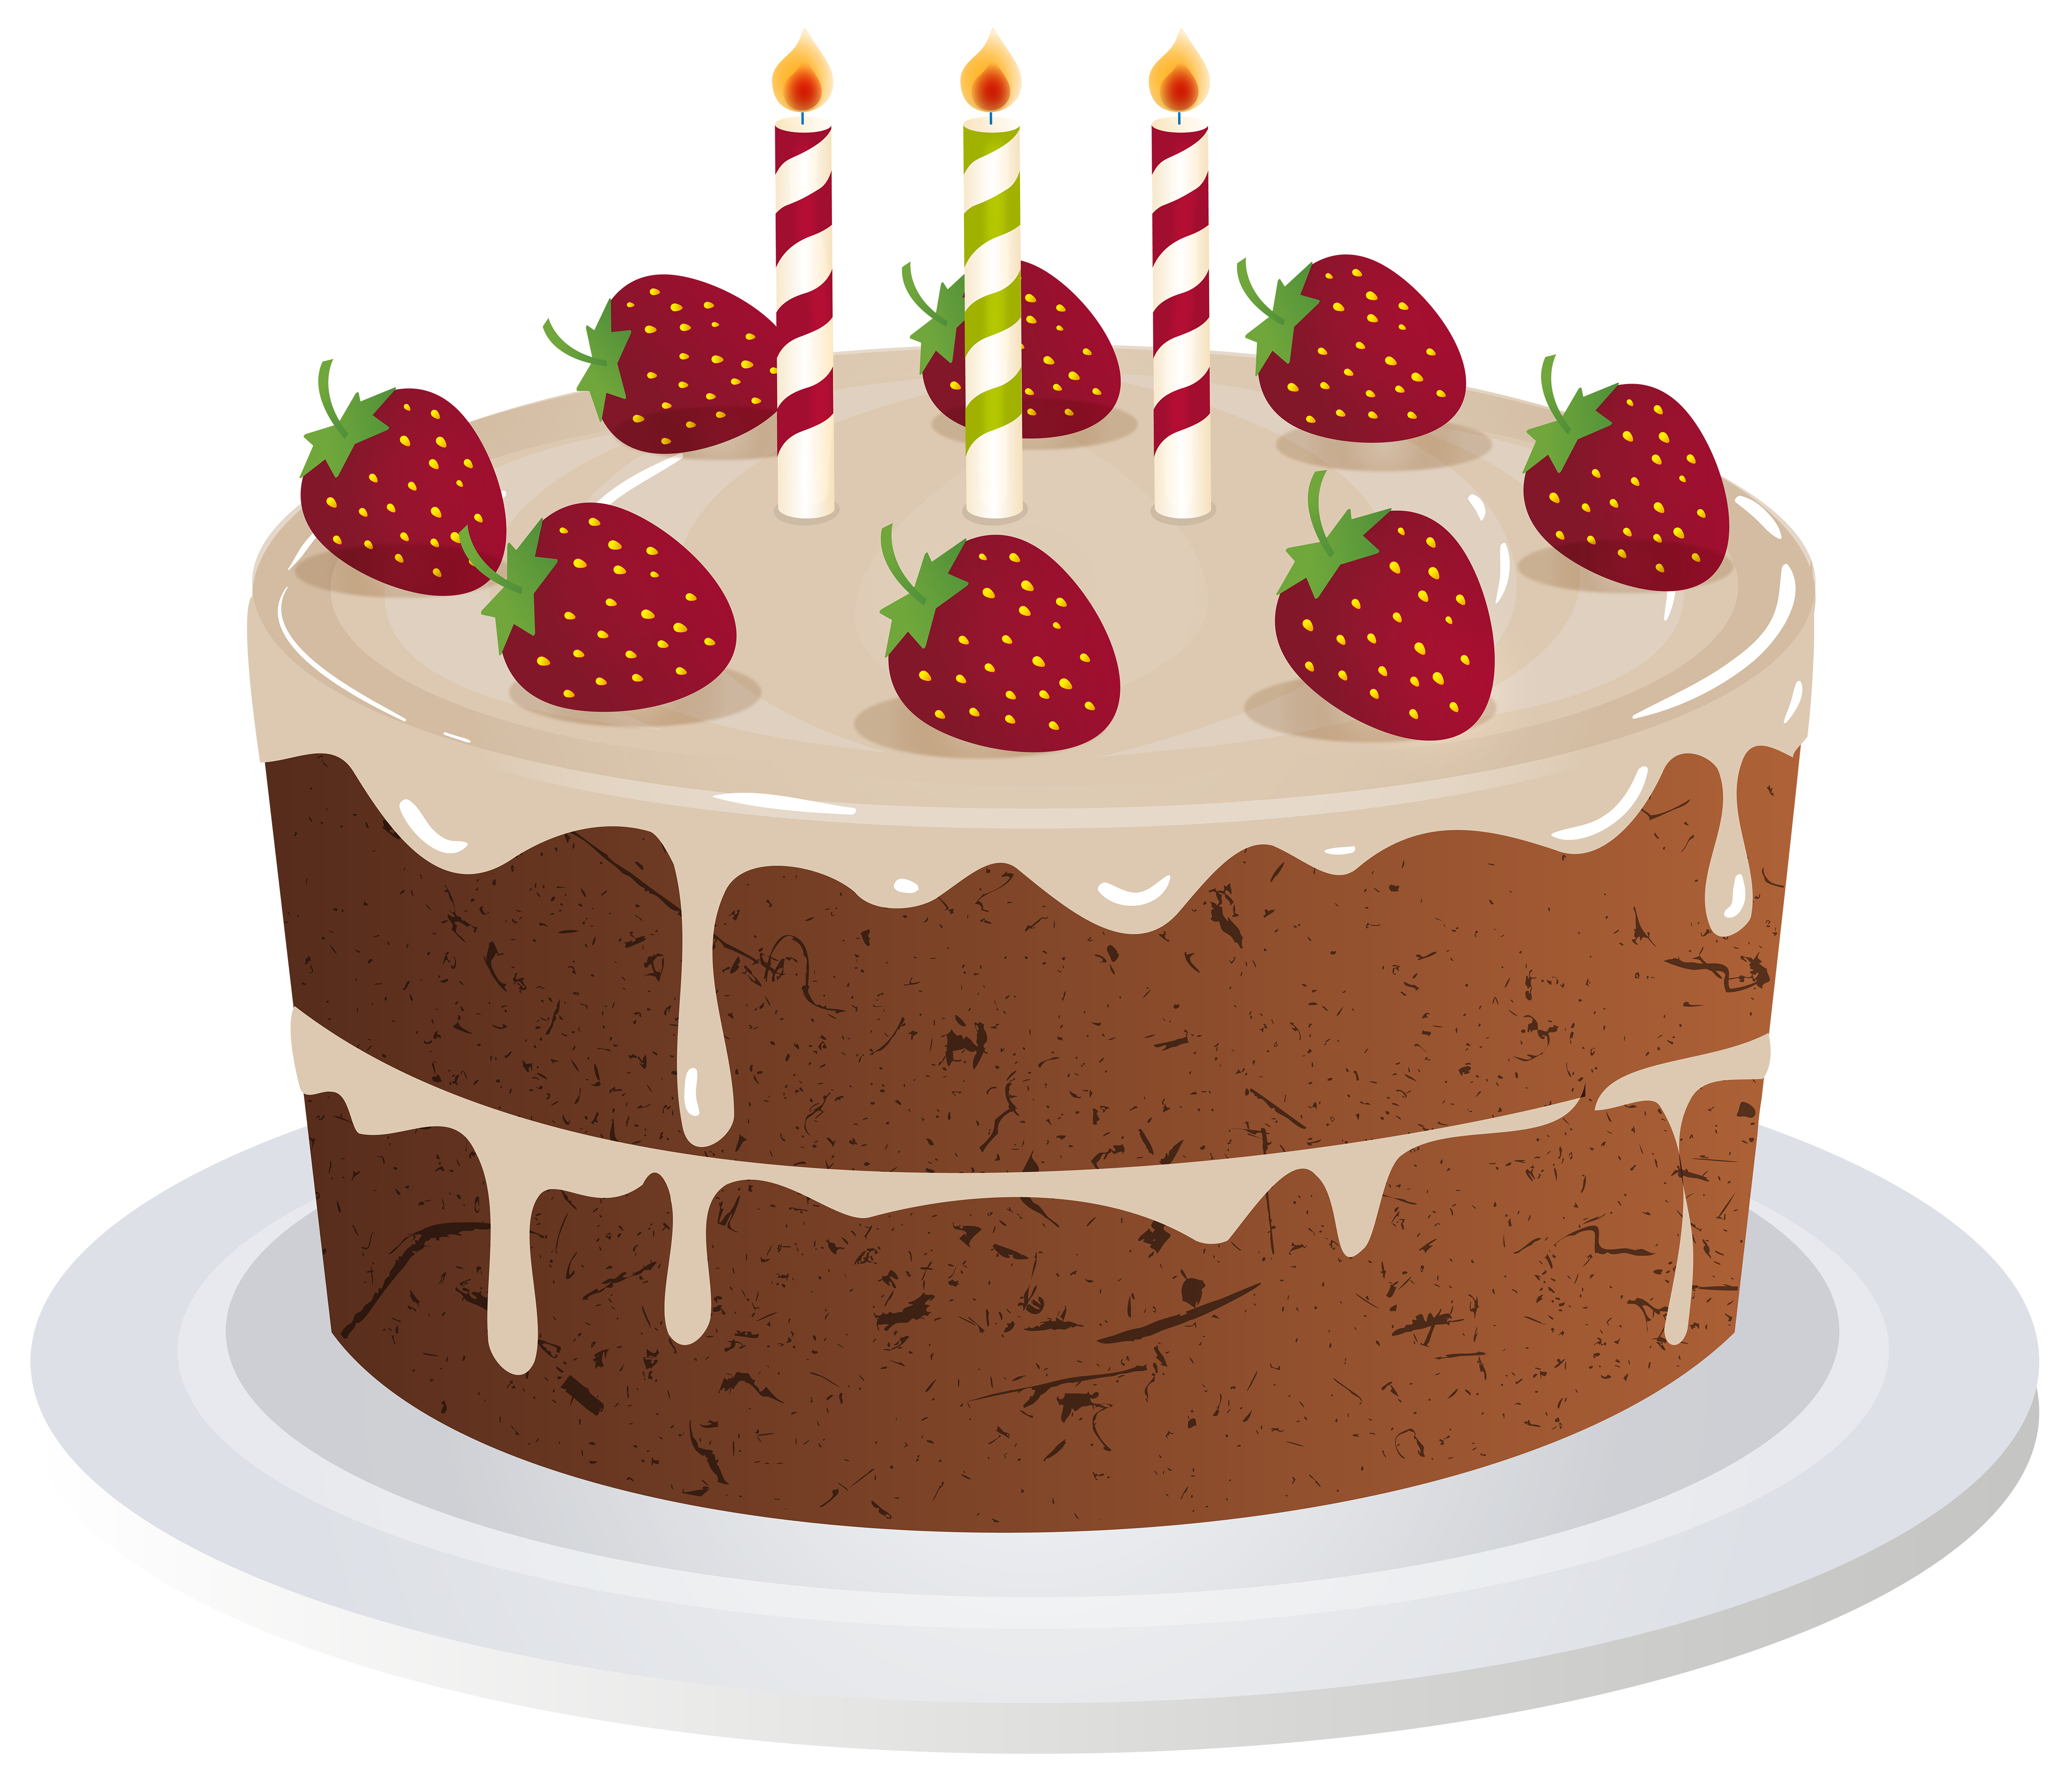 Birthday cake transparent png. Desserts clipart banner